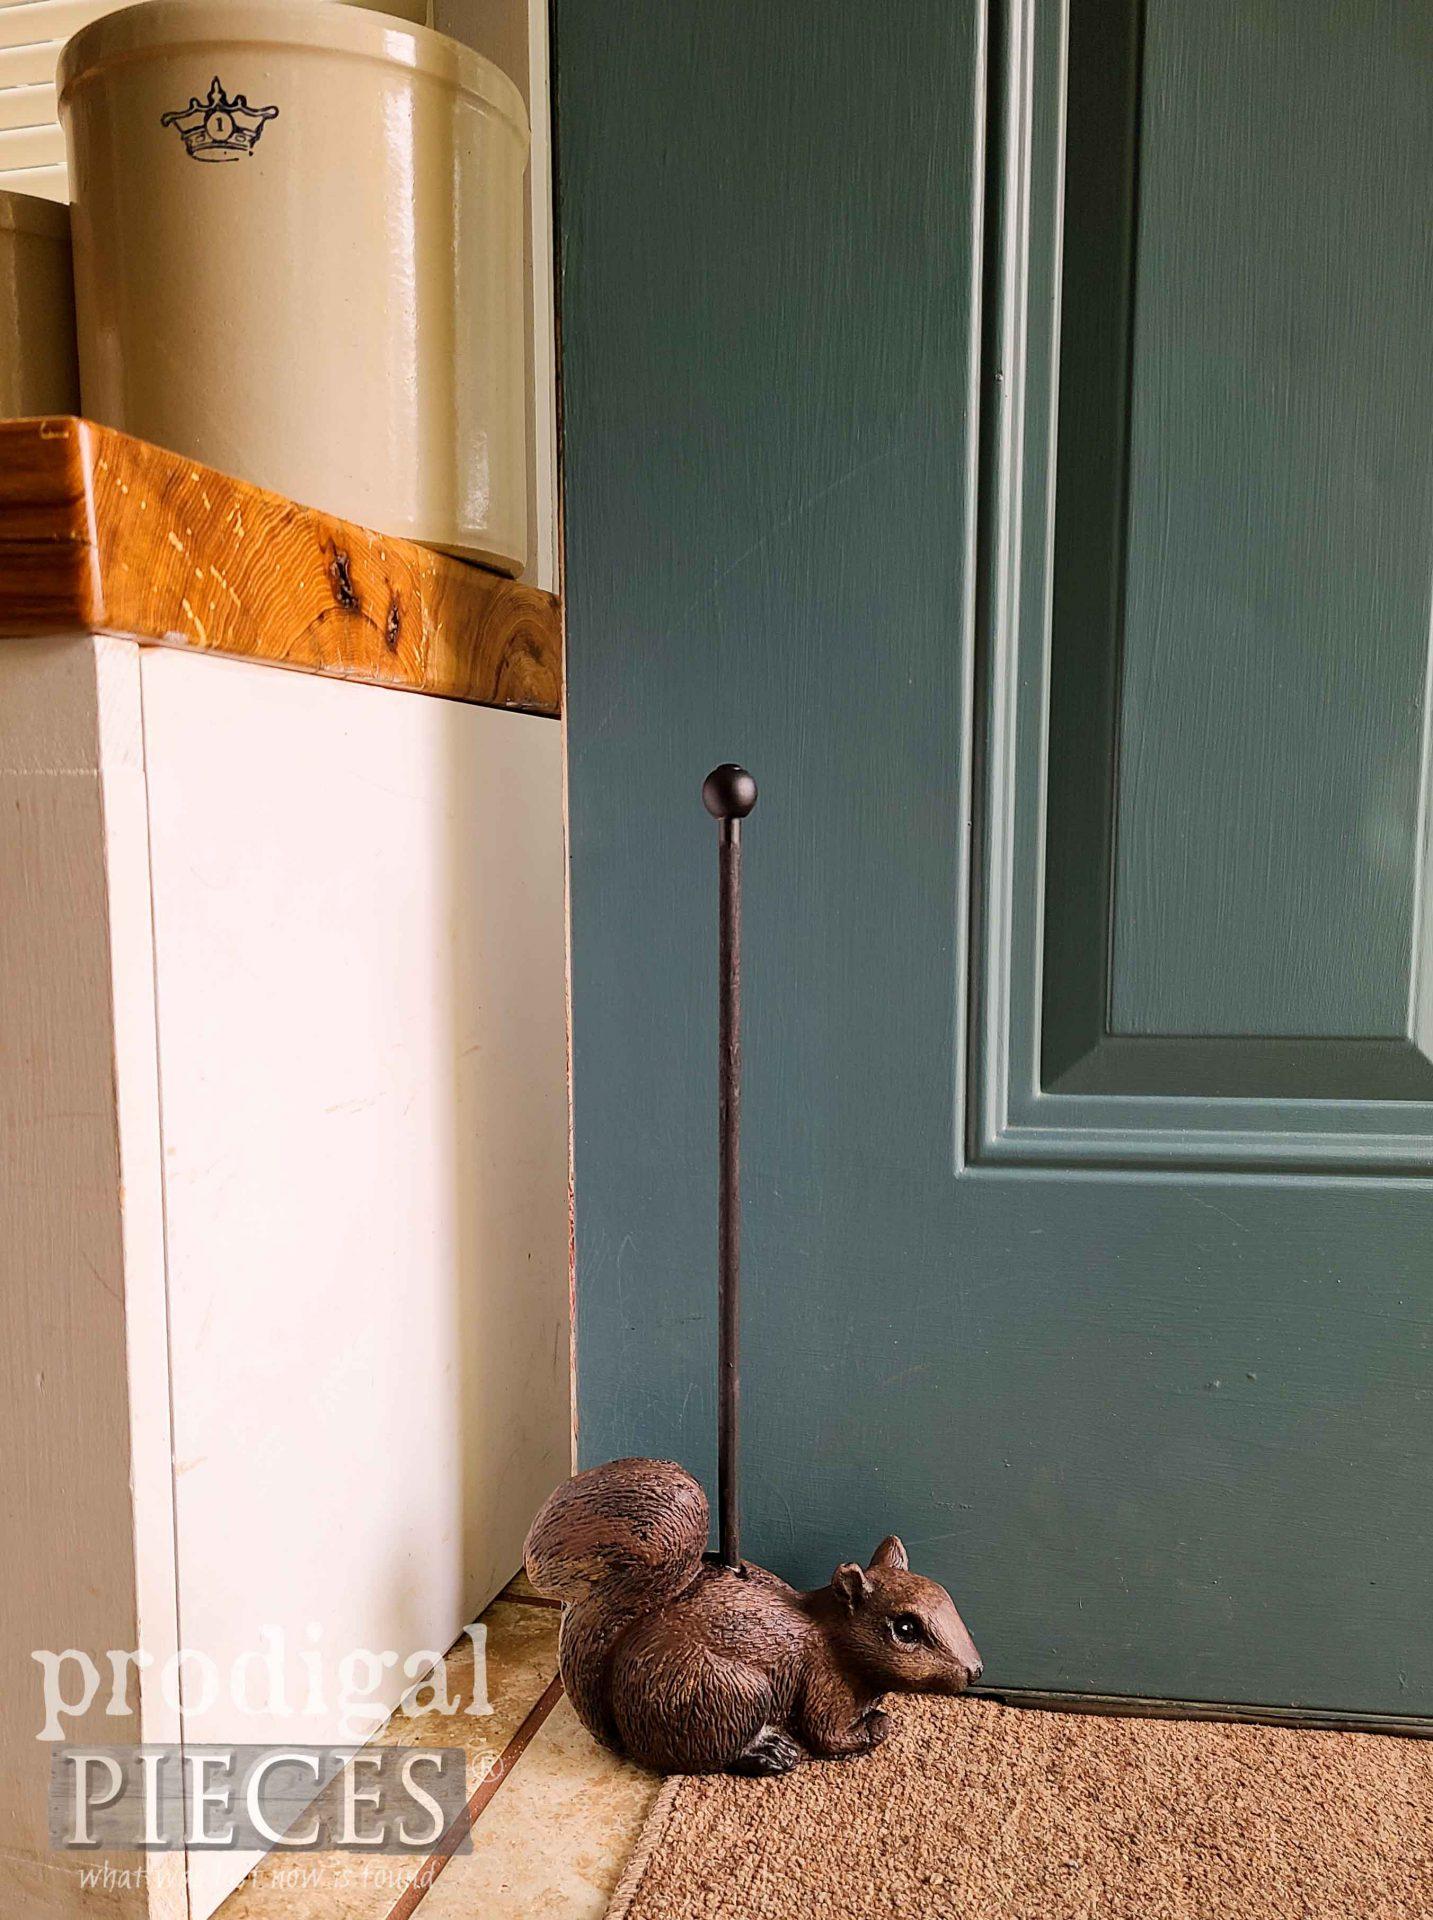 Concrete Squirrel Doorstop made by Larissa of Prodigal Pieces | prodigalpieces.com #prodigalpieces #diy #handmade #home #homedecor